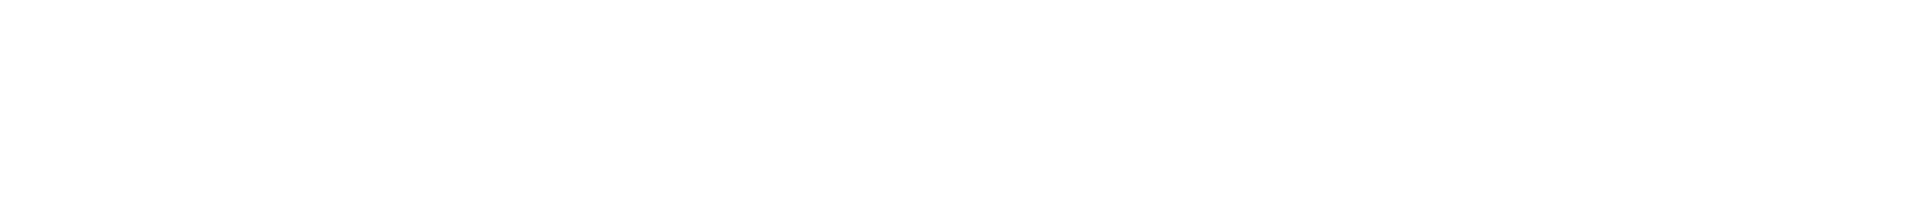 i-SPEED 220/221 logo.